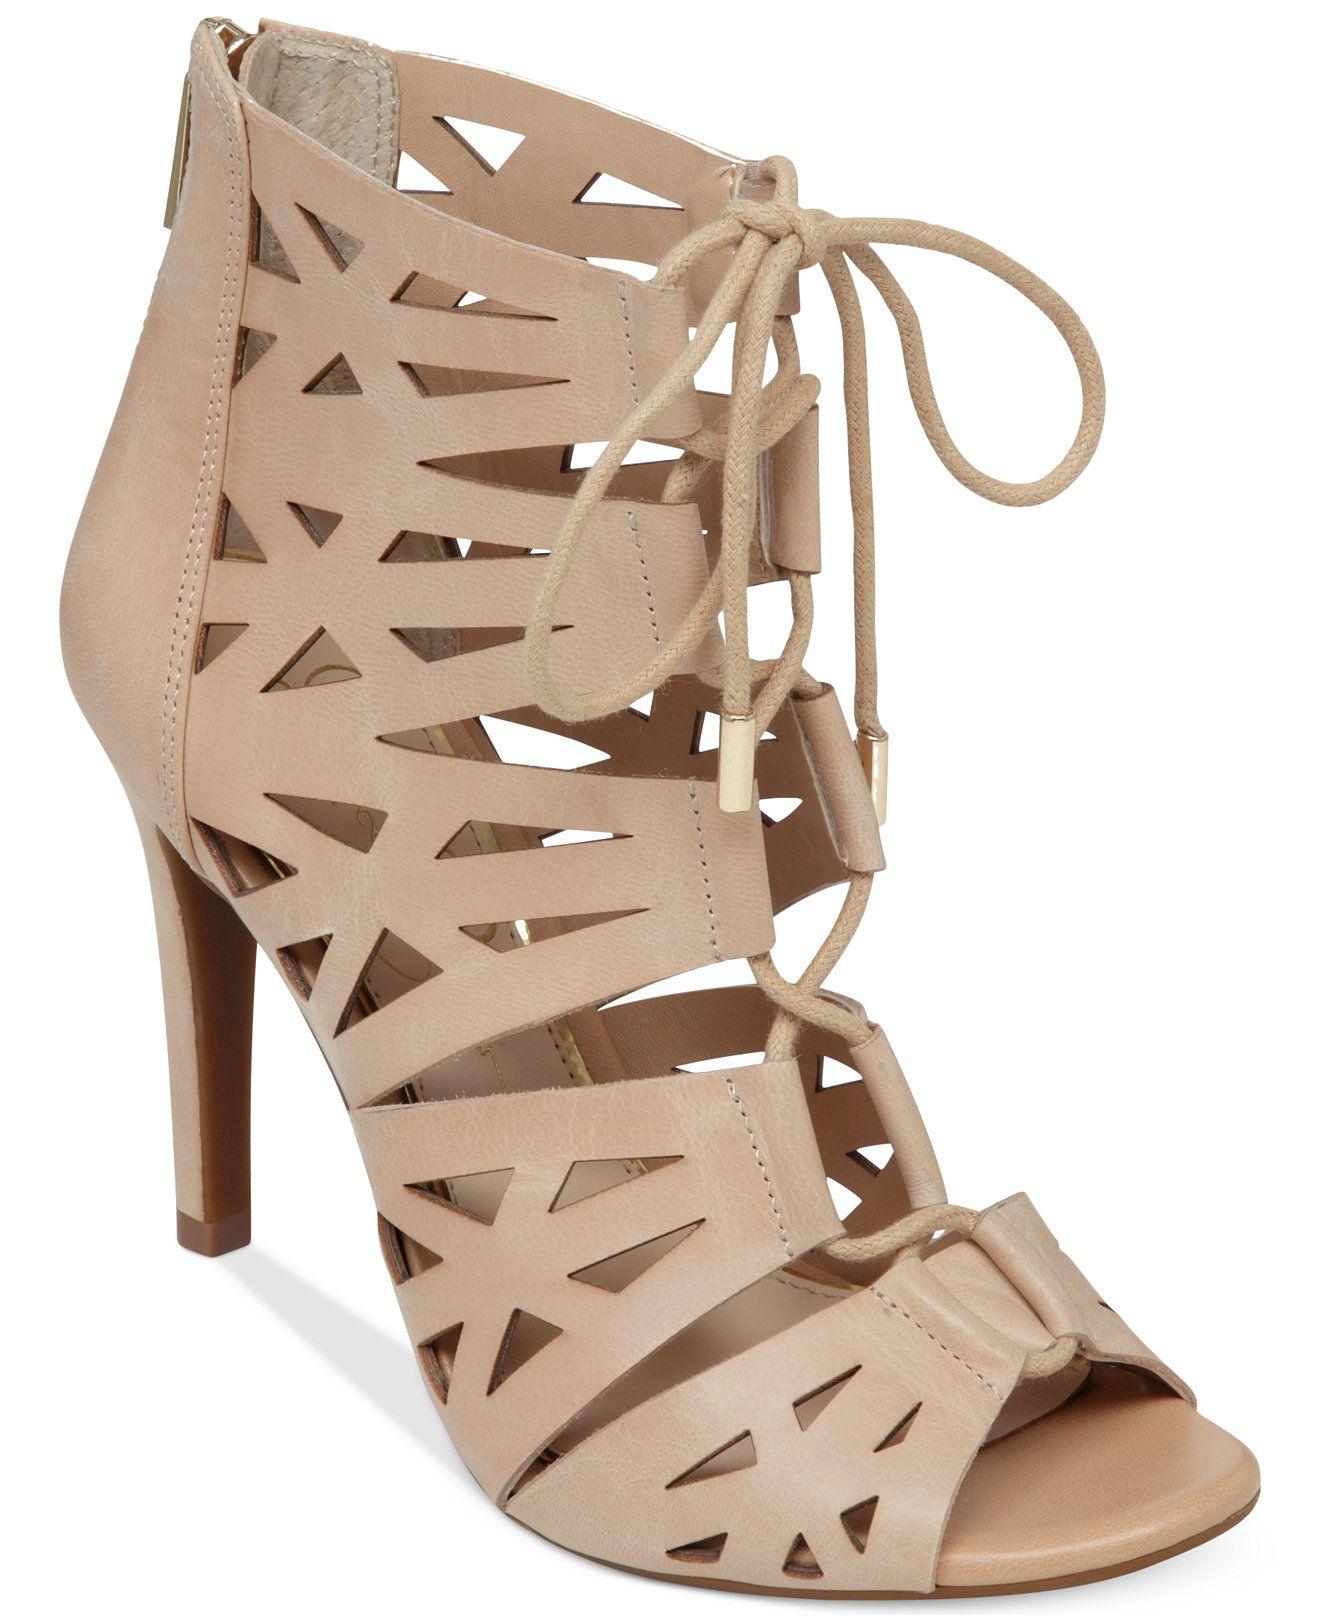 cb35009924c Jessica Simpson Emerita Gladiator Dress Sandals - Shoes - Macy s ...